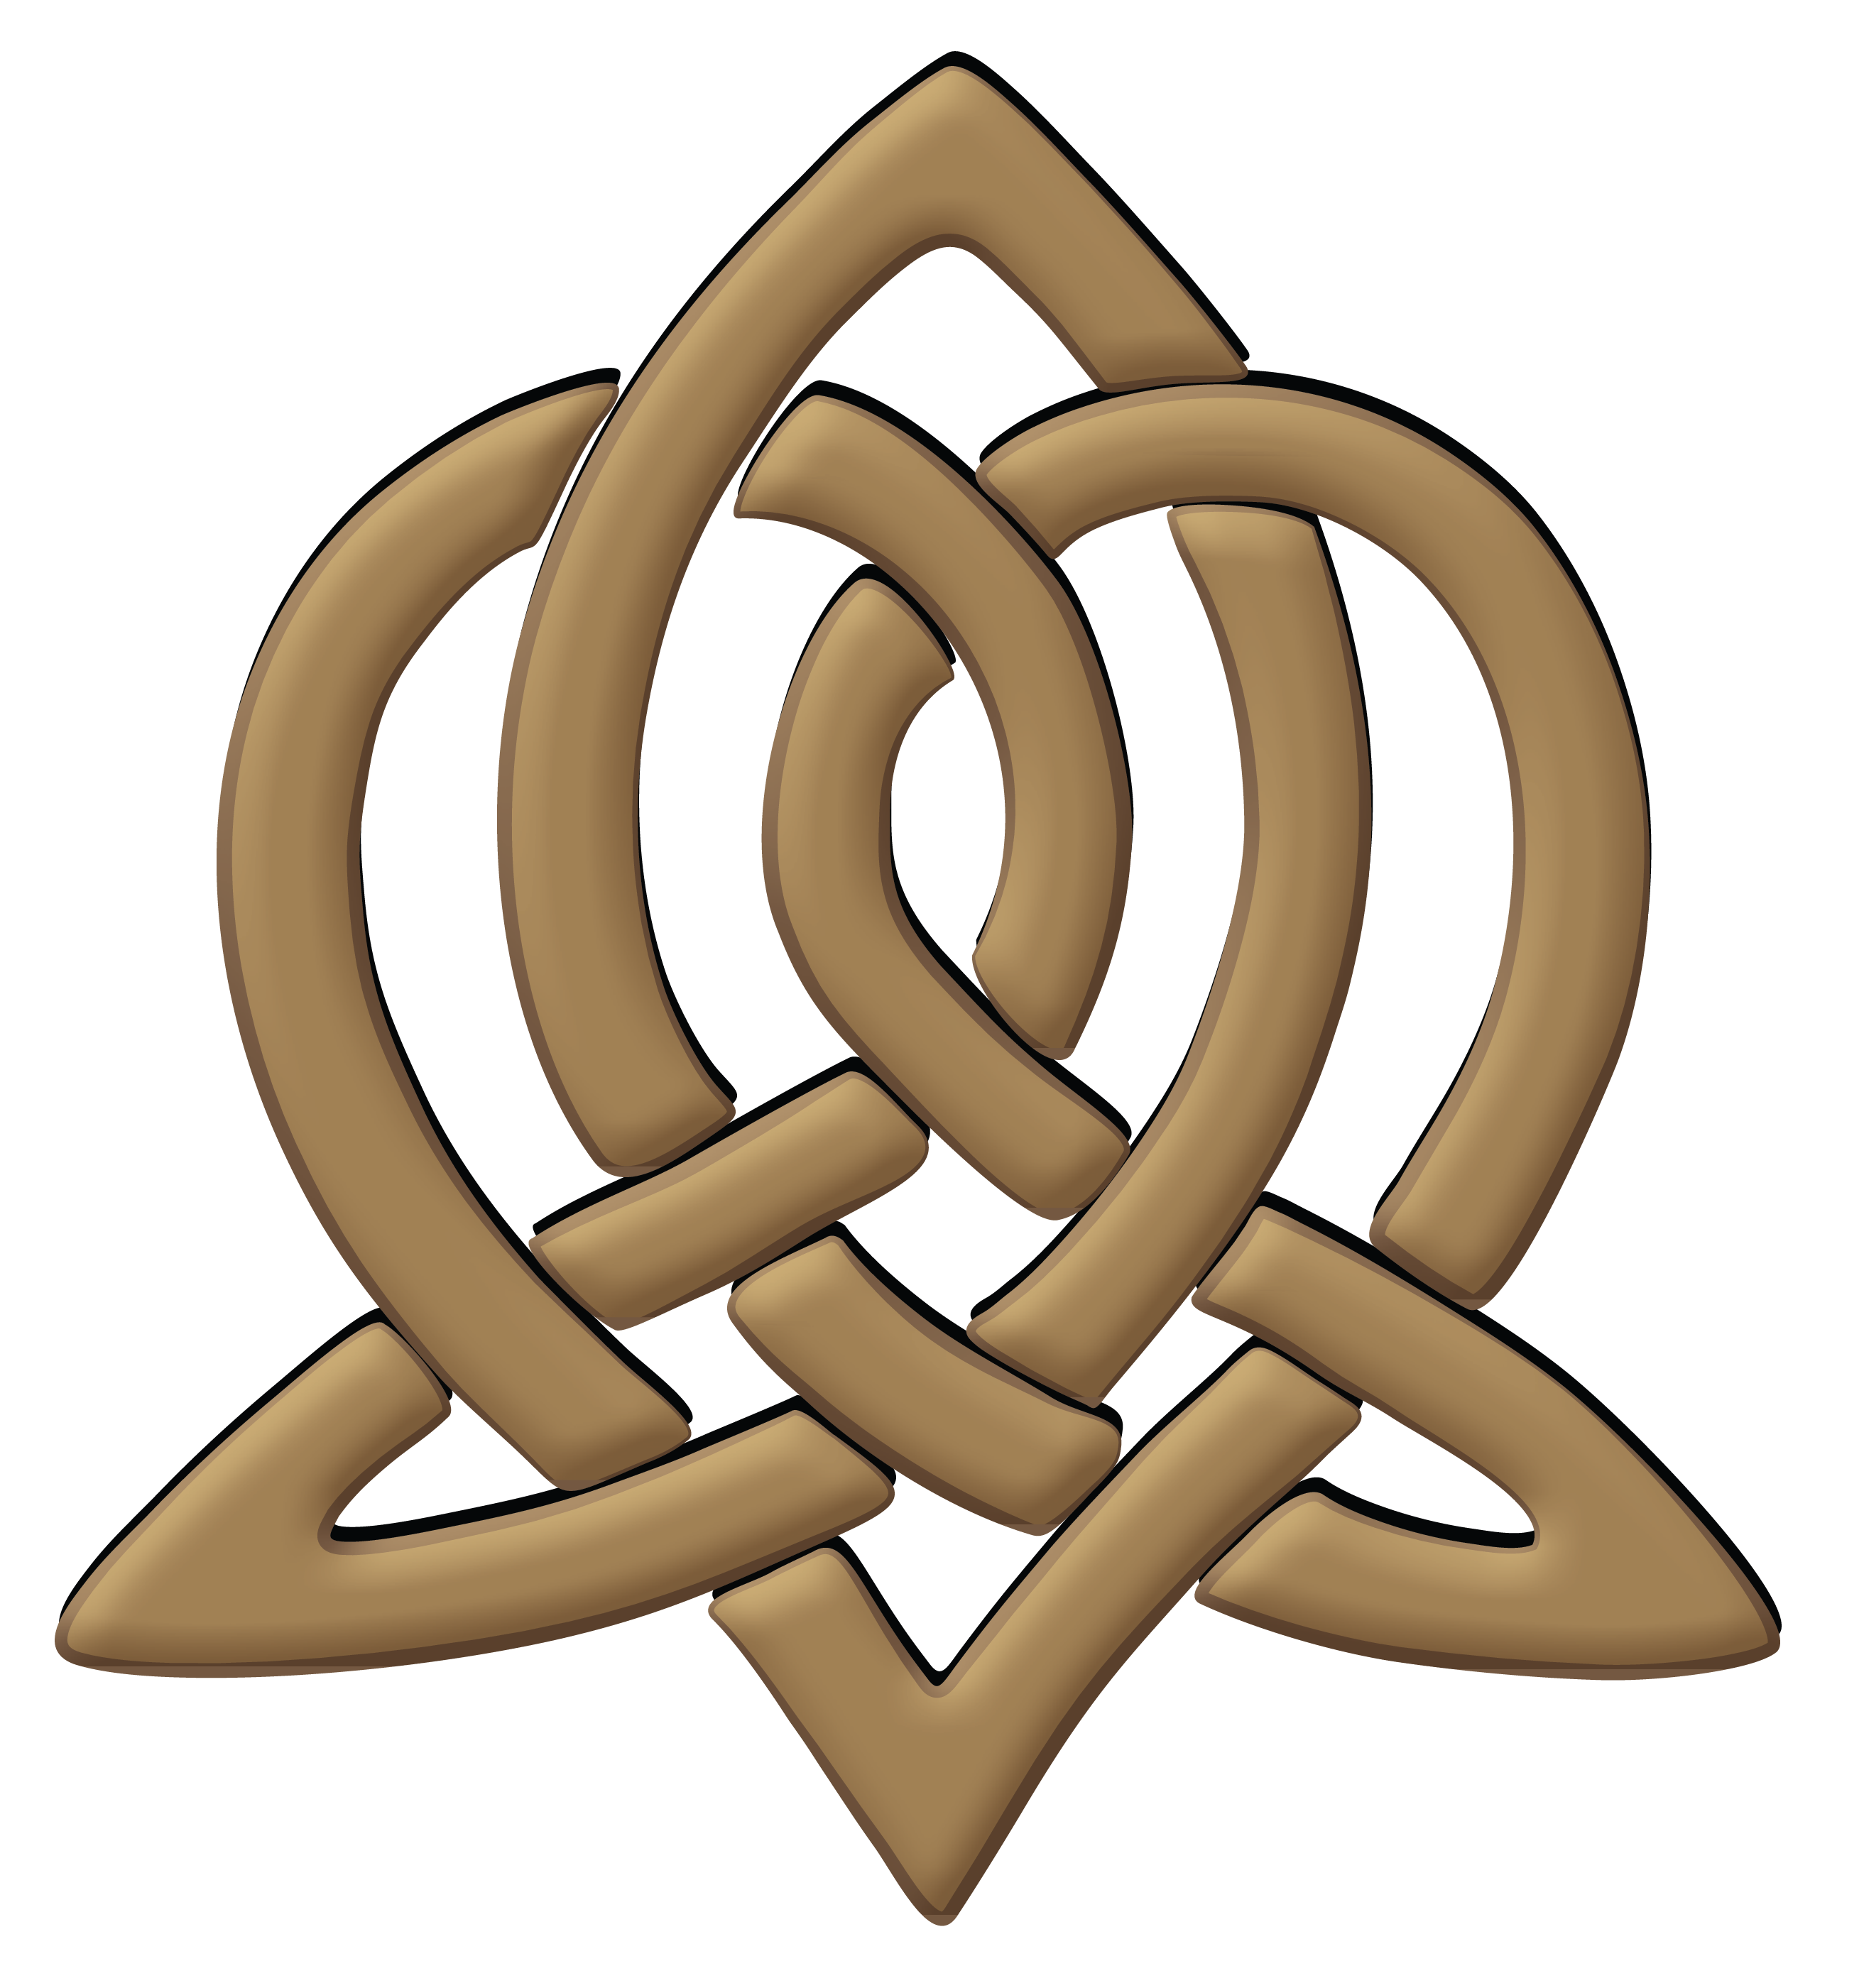 The dearborn collapsed logo. Clipart restaurant restaurant person